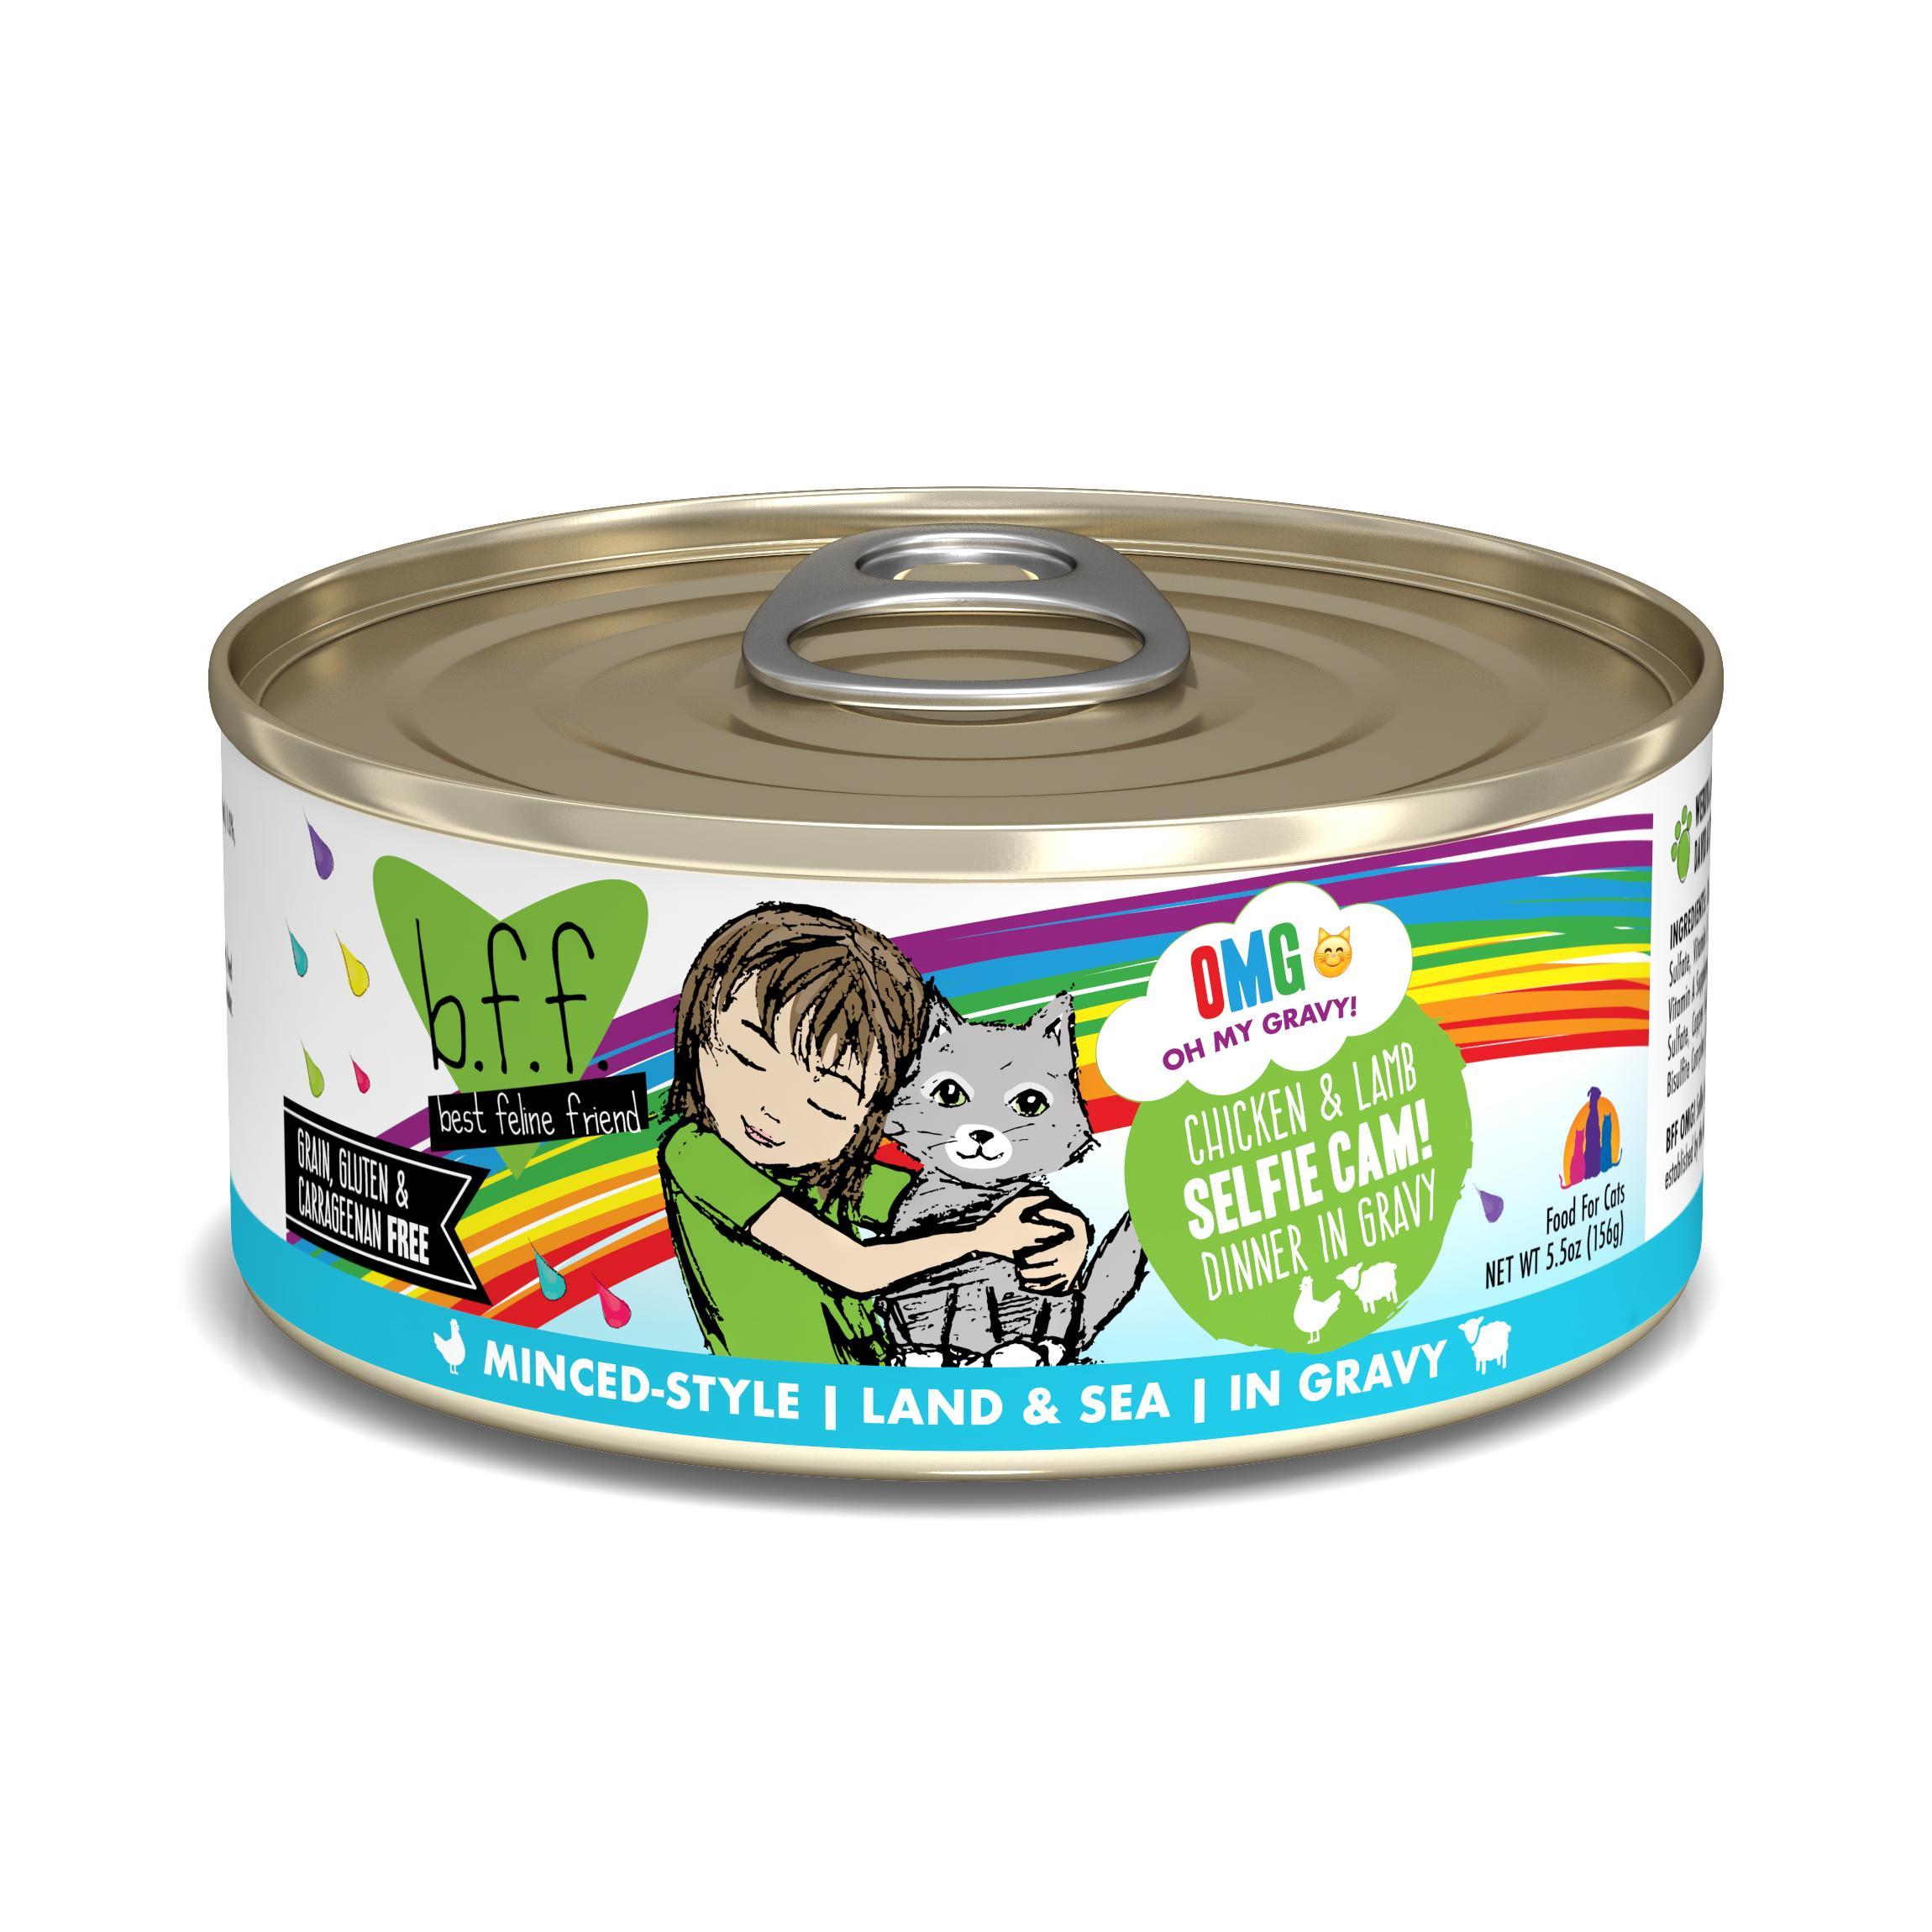 BFF Oh My Gravy! Selfie Cam! Chicken & Lamb Dinner in Gravy Grain-Free Wet Cat Food, 5.5-oz